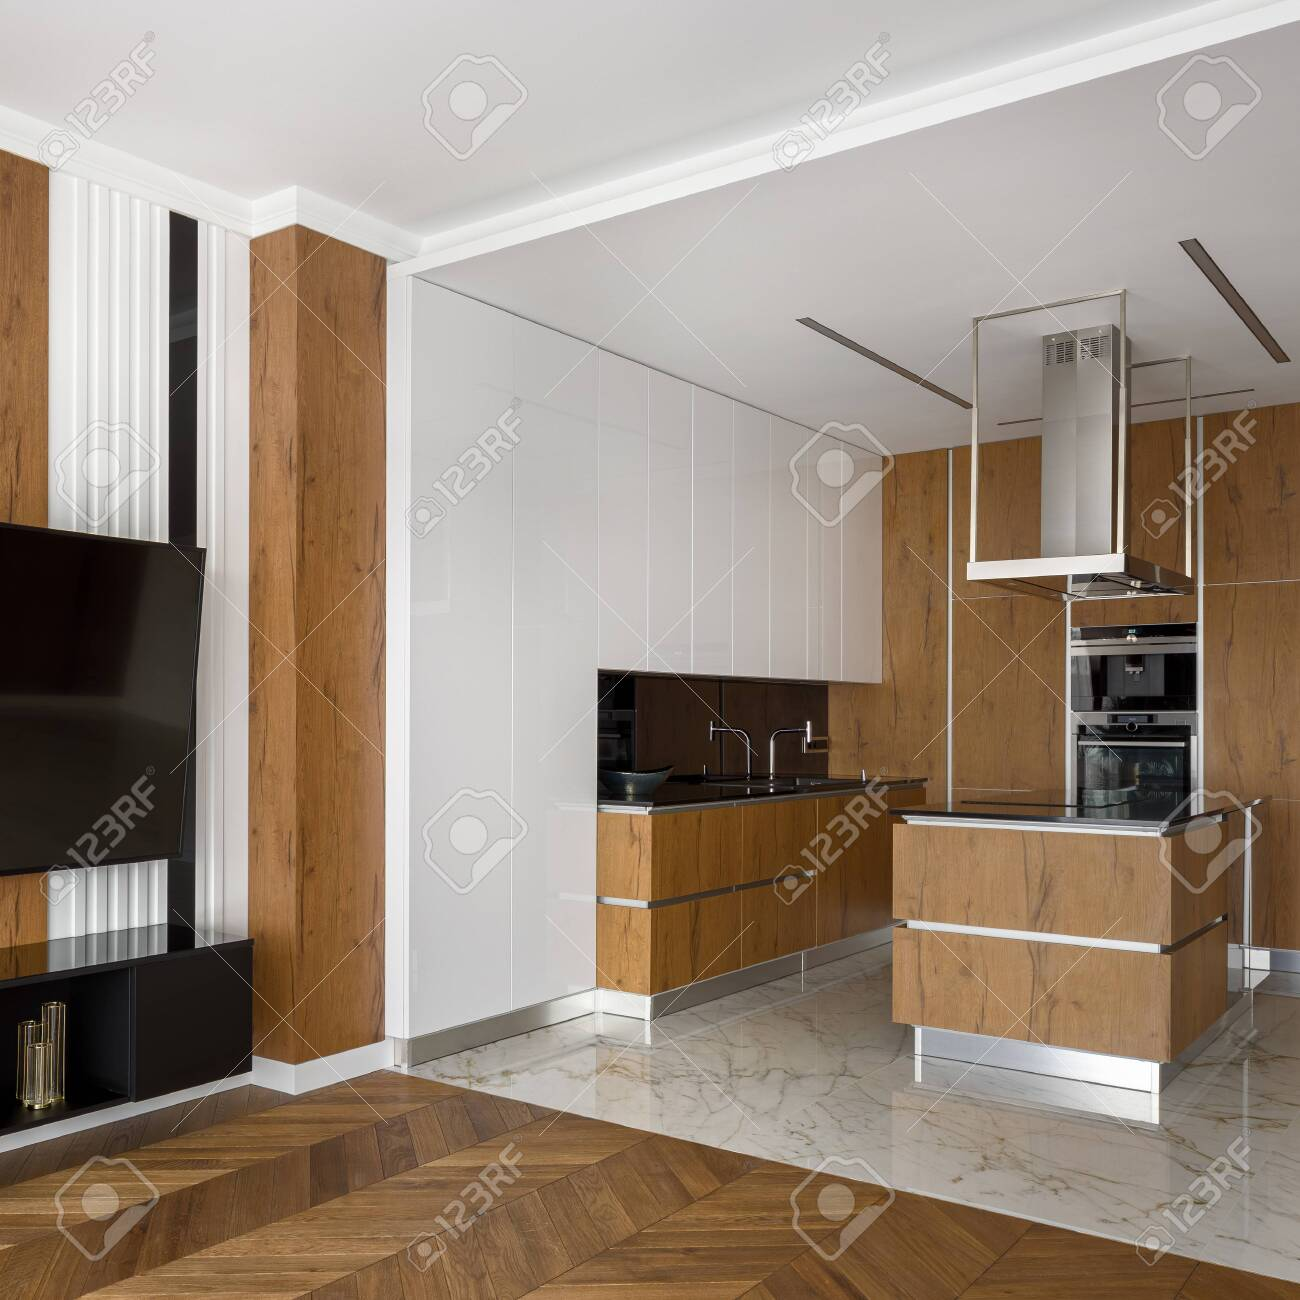 Elegant Kitchen In White And Wood And Marble Floor Open To Living Room With Big Television And Wooden Floor Fotos Retratos Imagenes Y Fotografia De Archivo Libres De Derecho Image 151987460